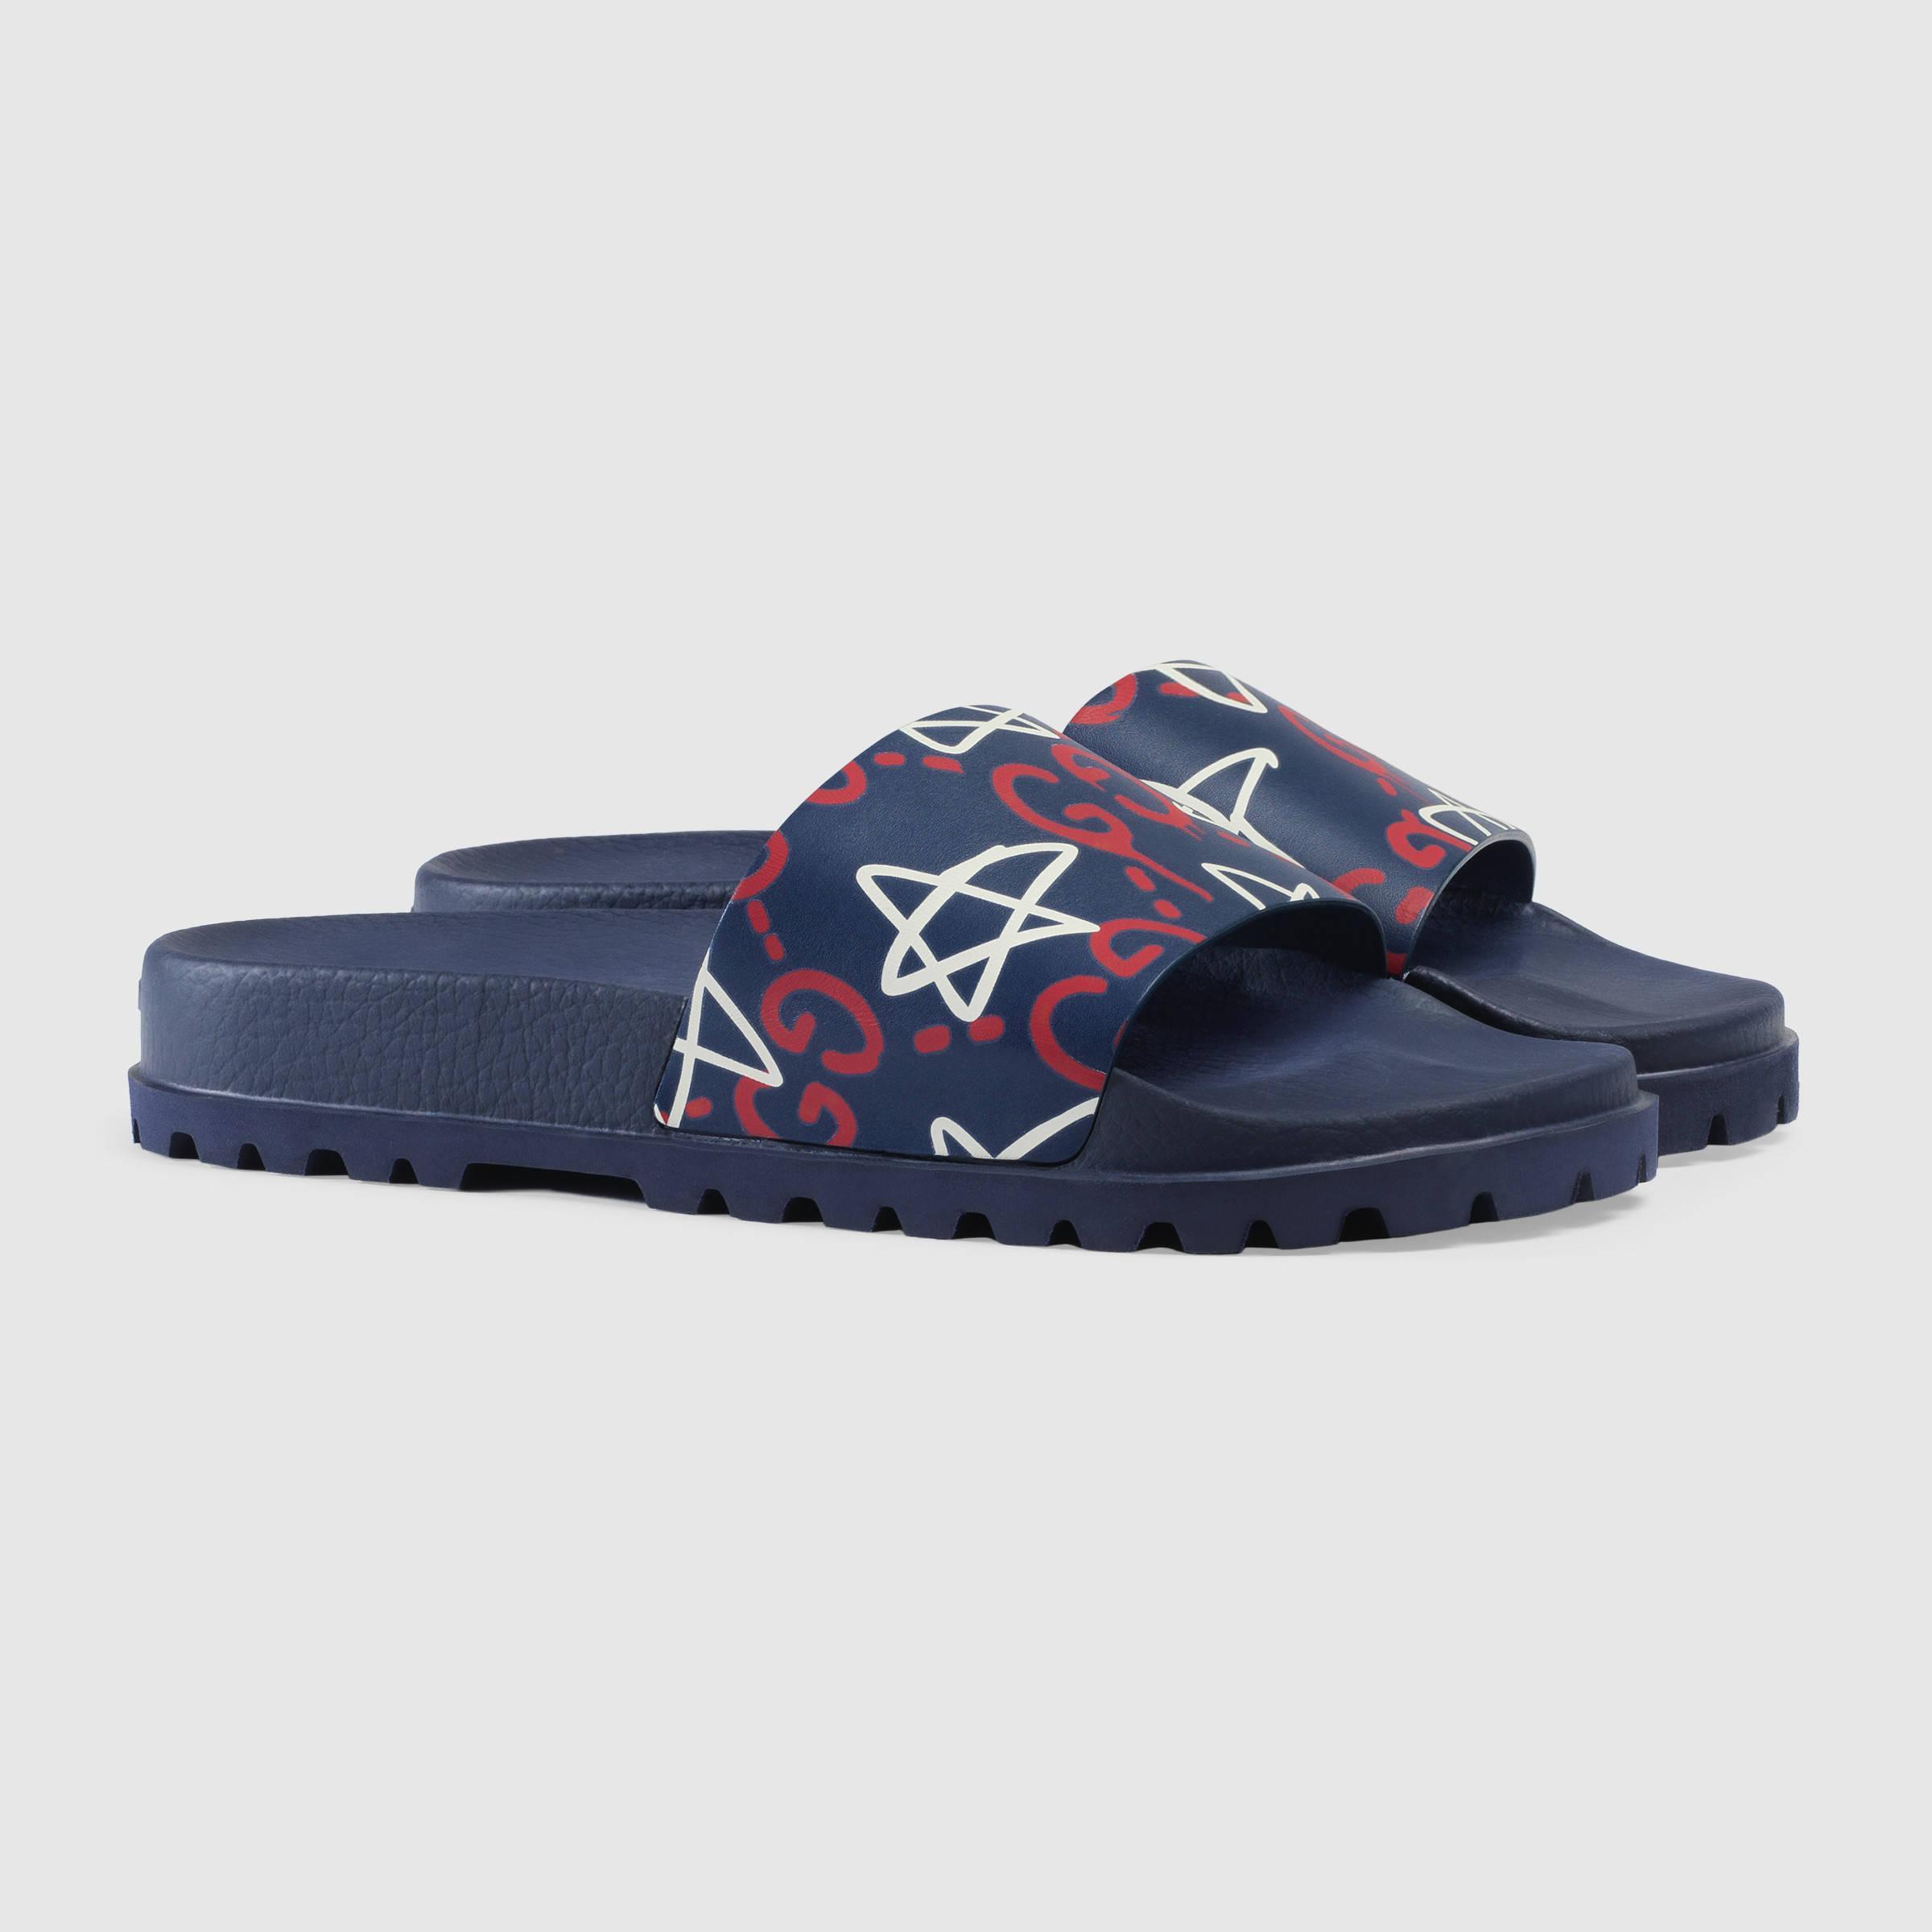 2a24de3e9aa4 Lyst - Gucci Ghost Slide Sandal for Men